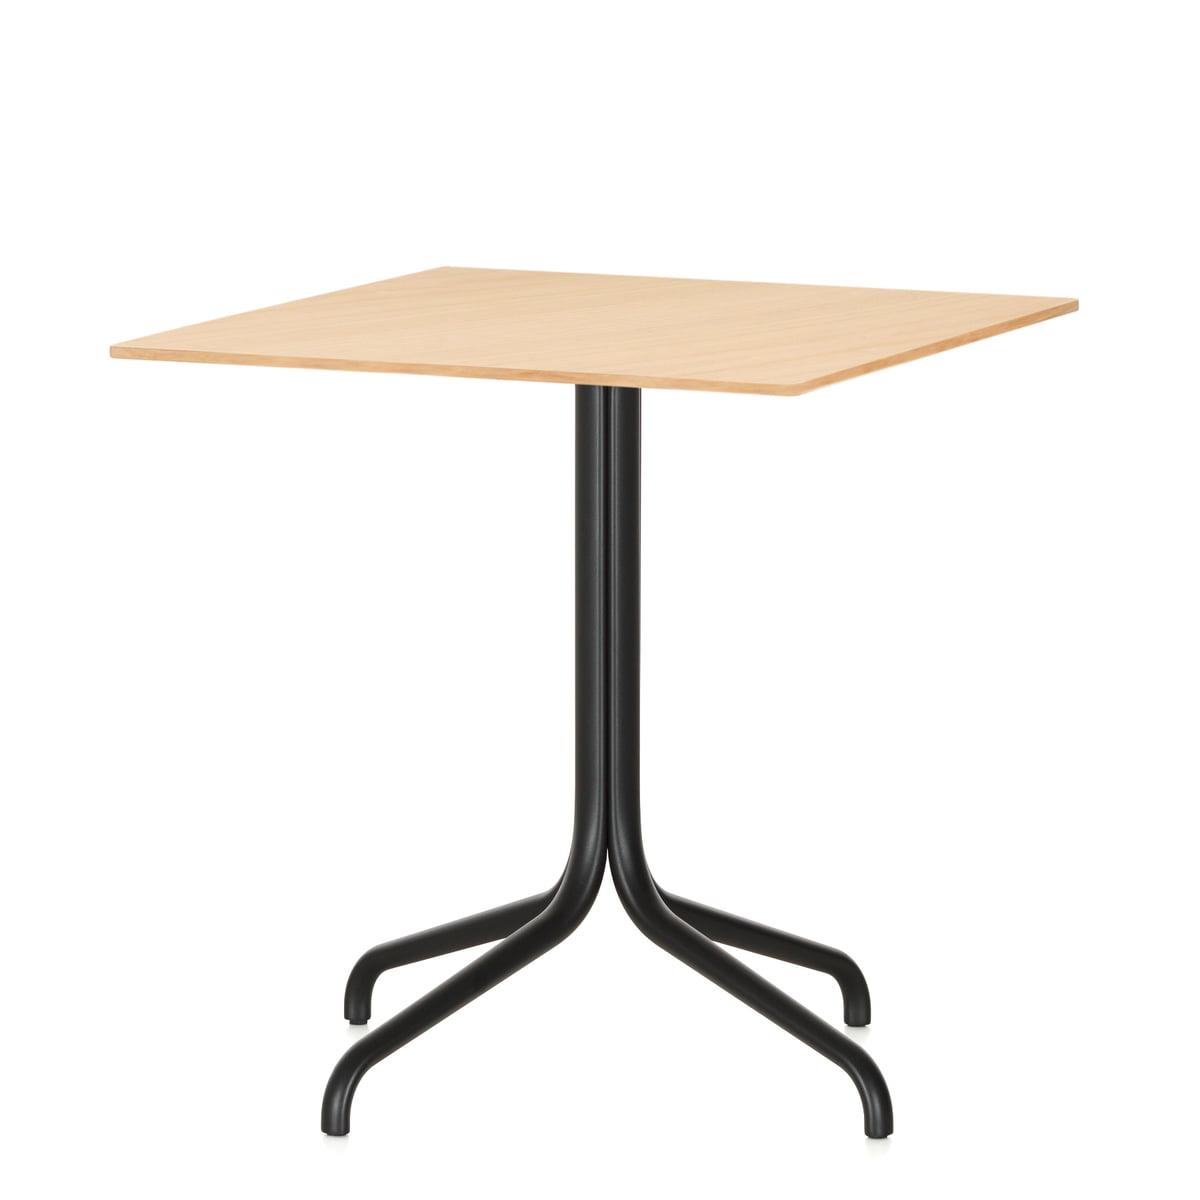 Marvelous Belleville Bistro Table, Square, 75 X 75 Cm By Vitra In Light Oak Veneer